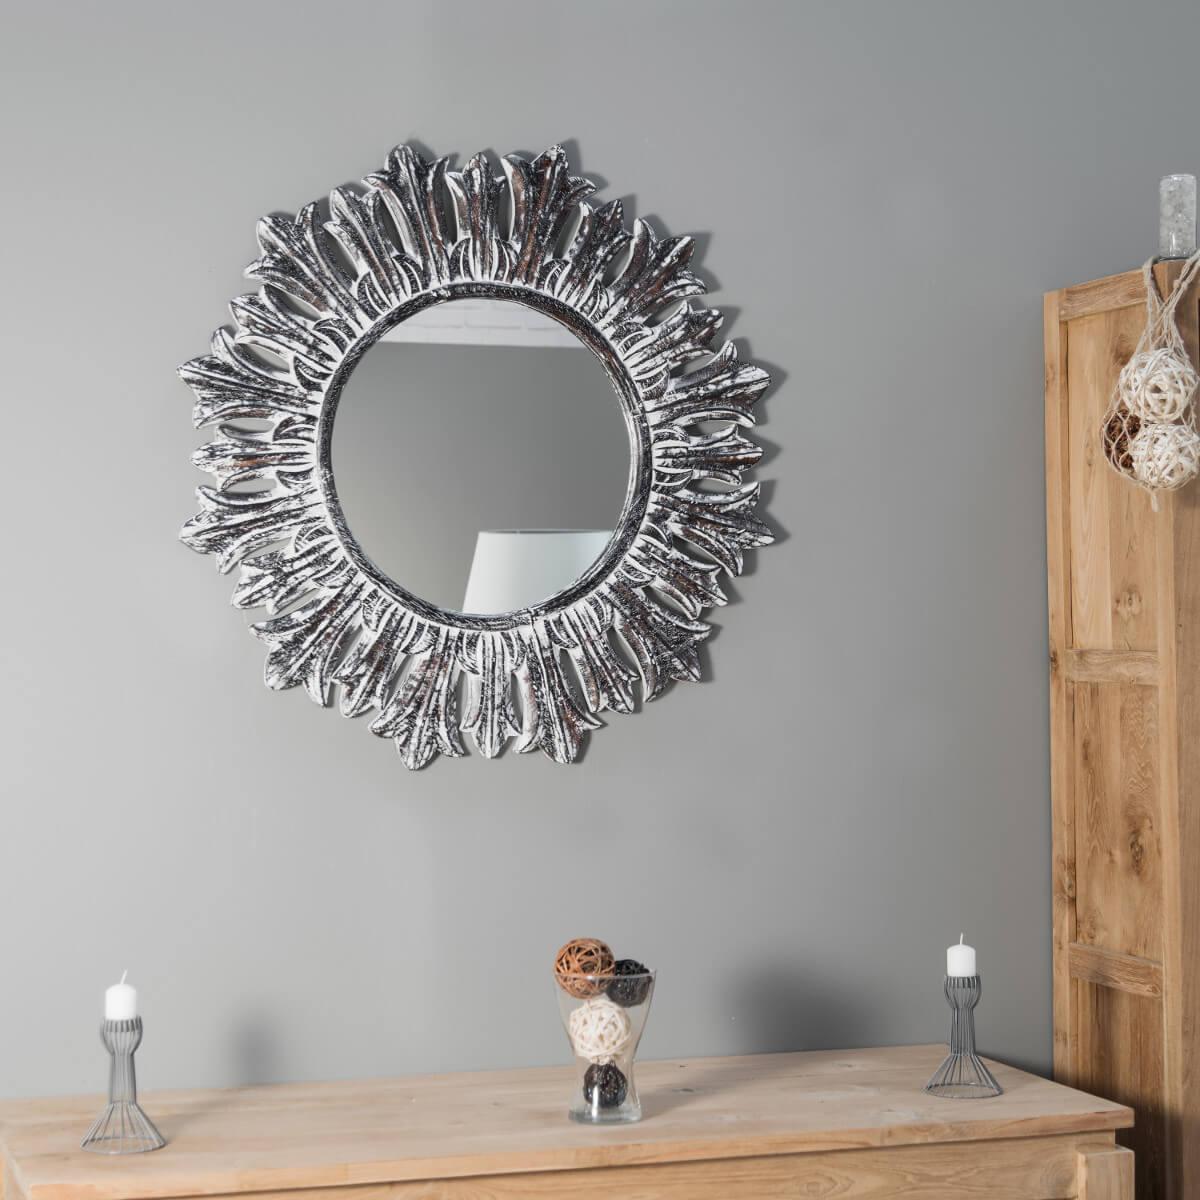 Espejo sol redondo de madera con p tina 90 cm for Espejos redondos con marco de madera